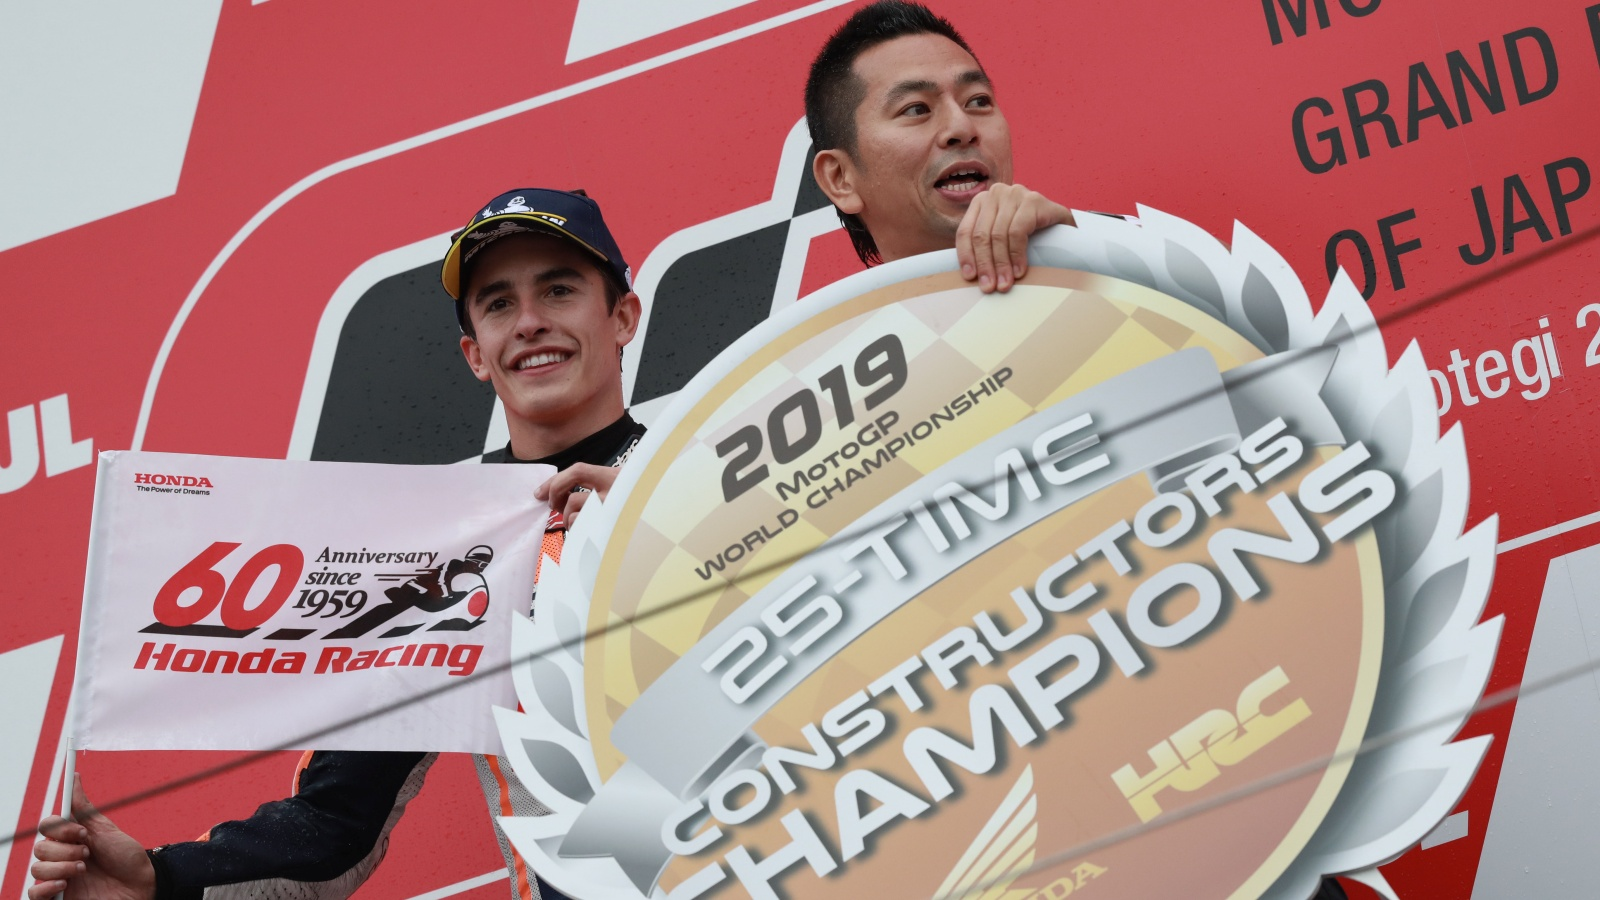 Marc Márquez regala a Honda el título de constructores de MotoGP 2019